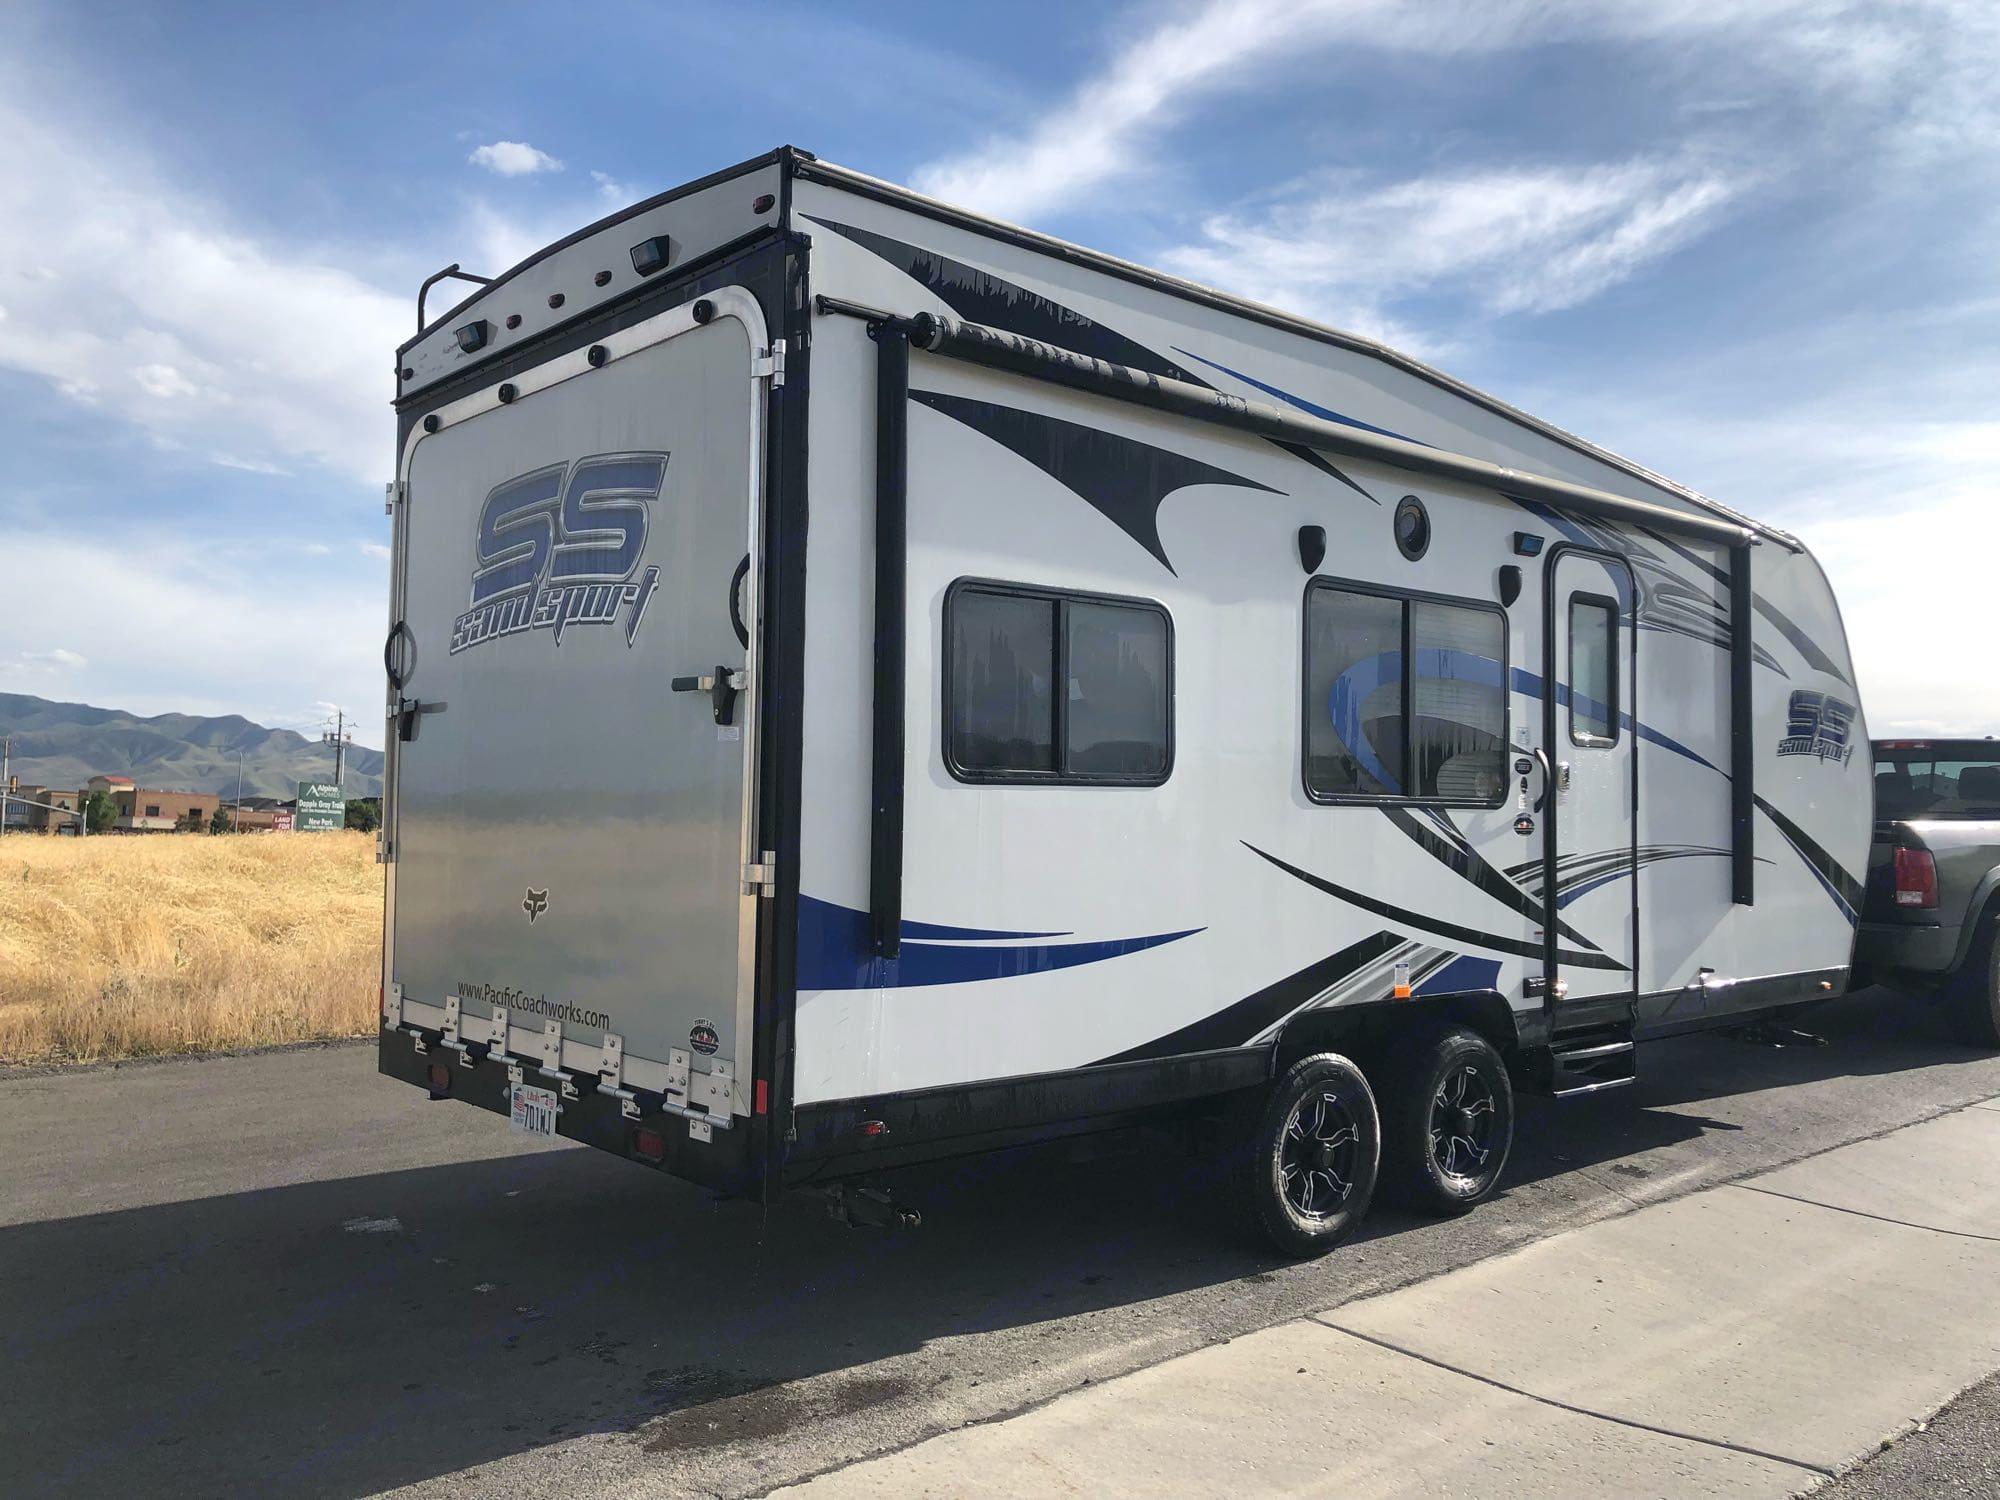 Pacific Coachworks Sandsport 2018